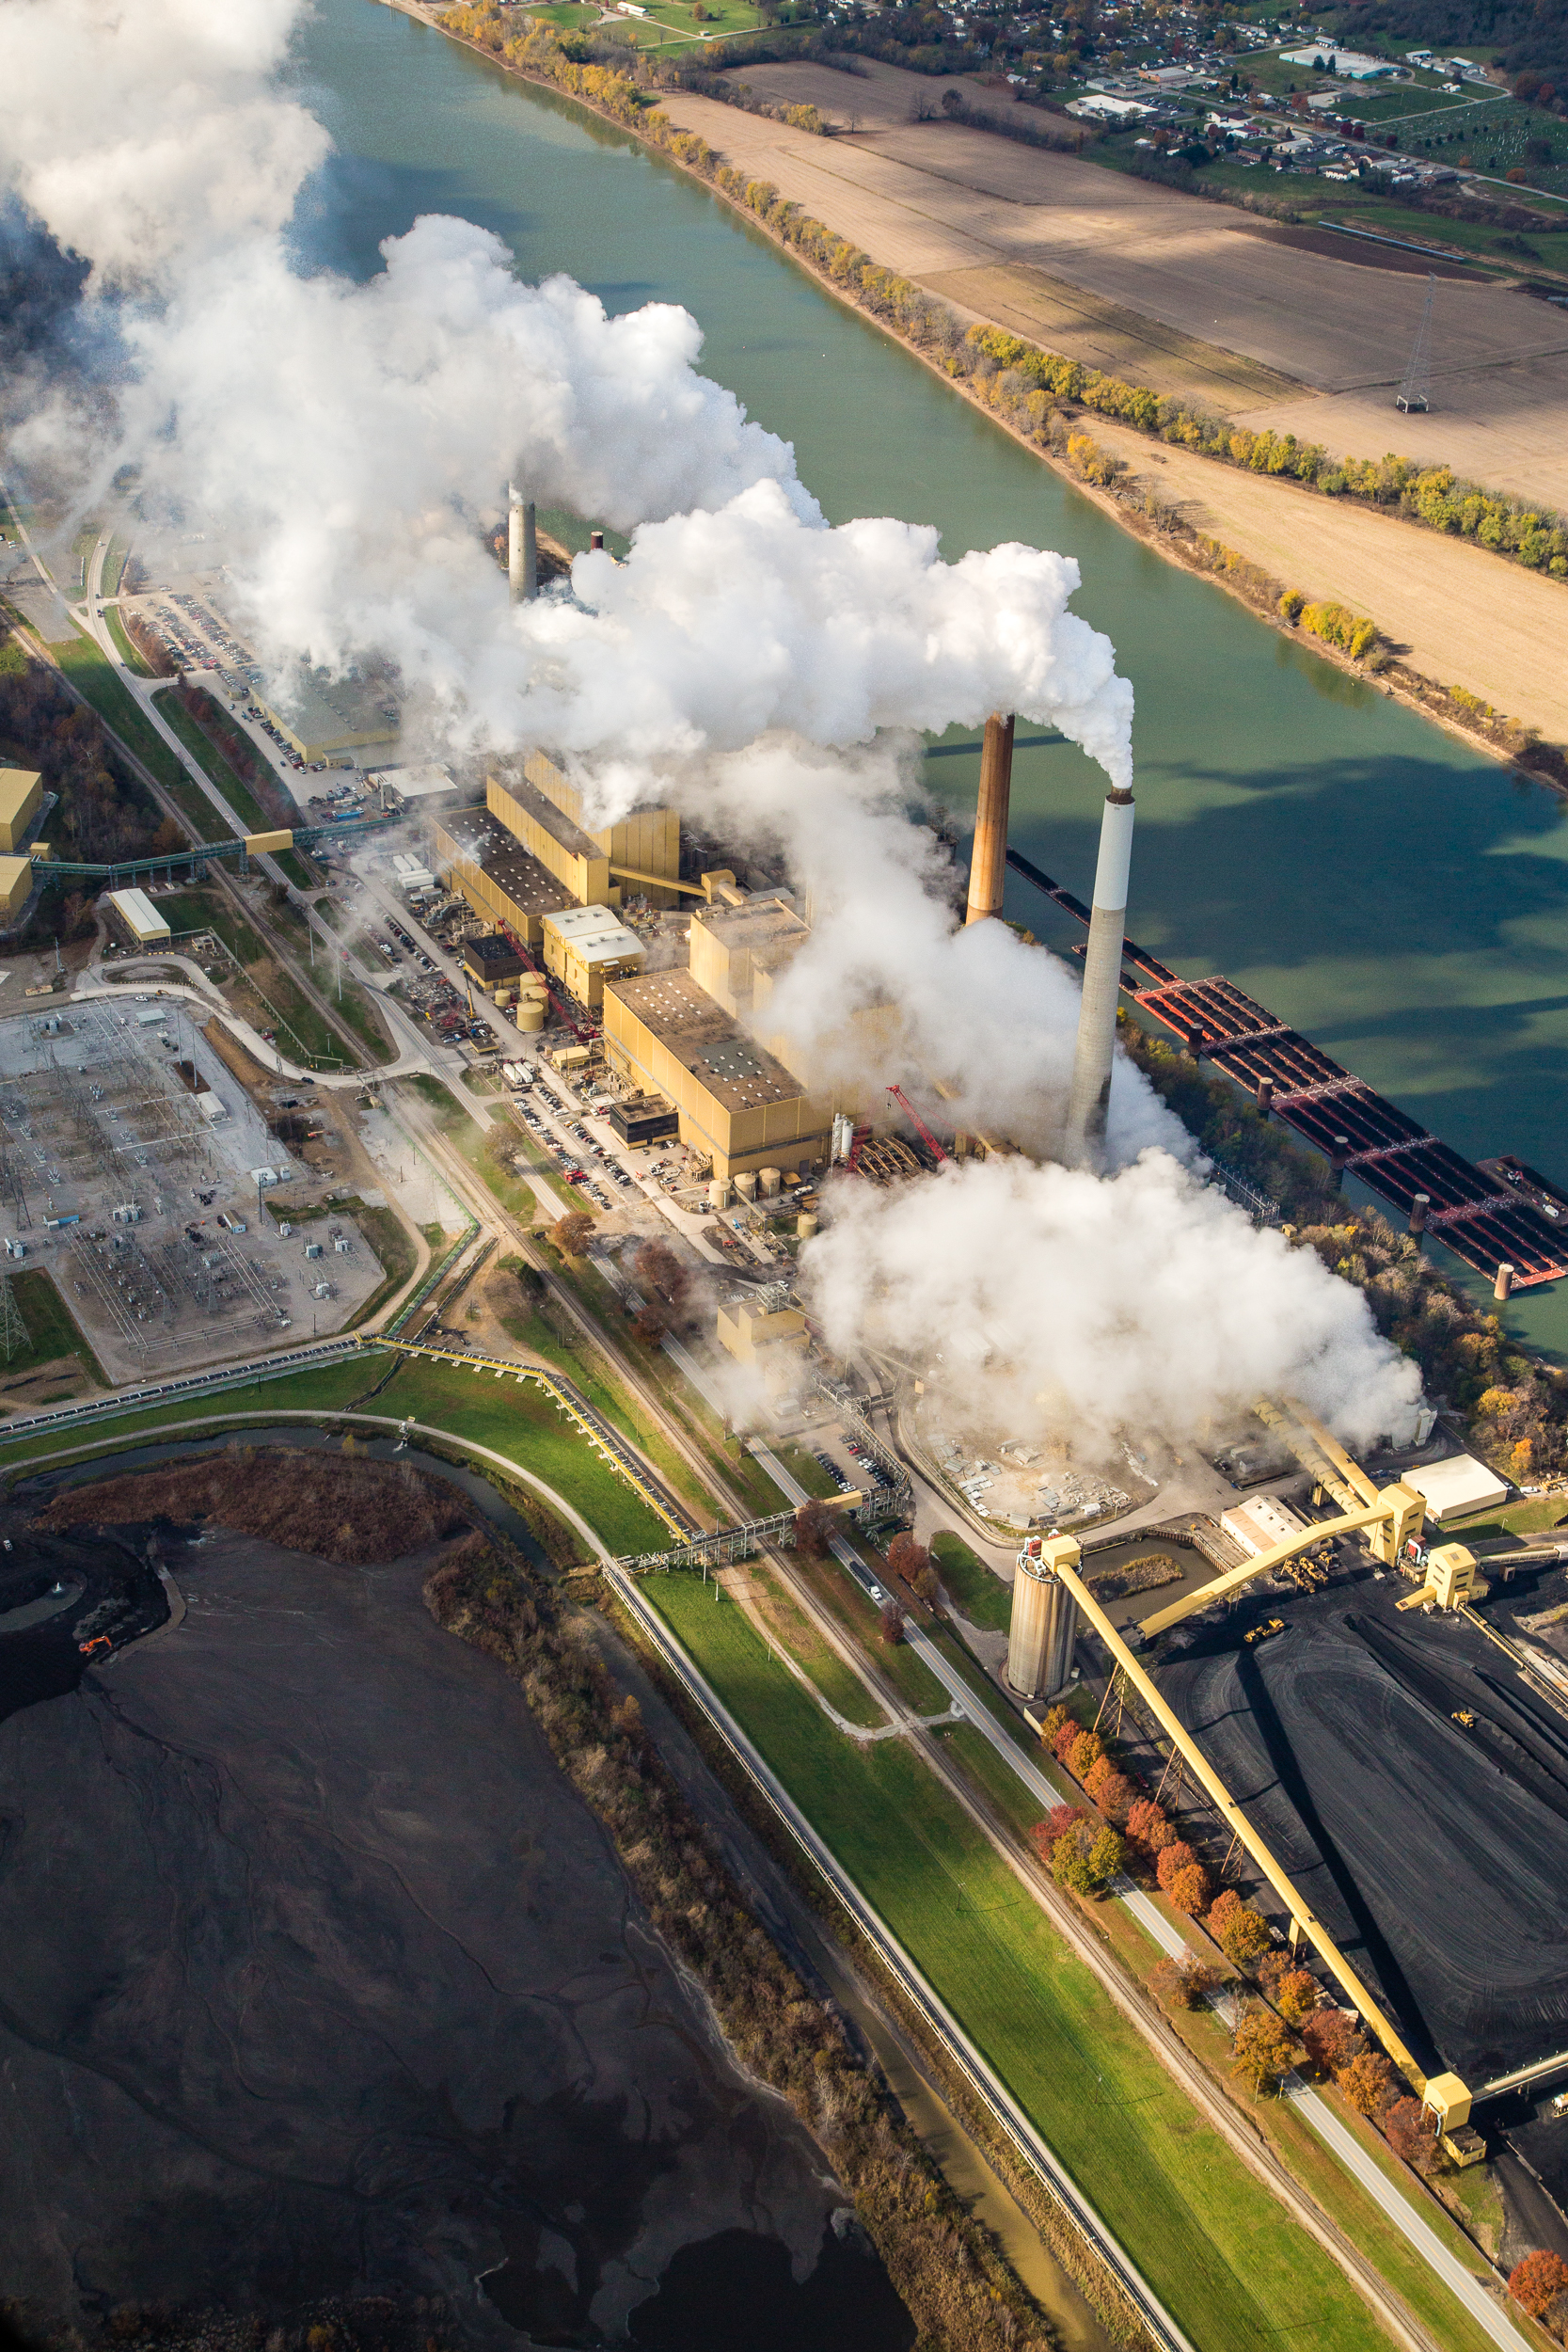 Mill Creek Station, coal power plant near Louisville, Kentucky on the Ohio River.